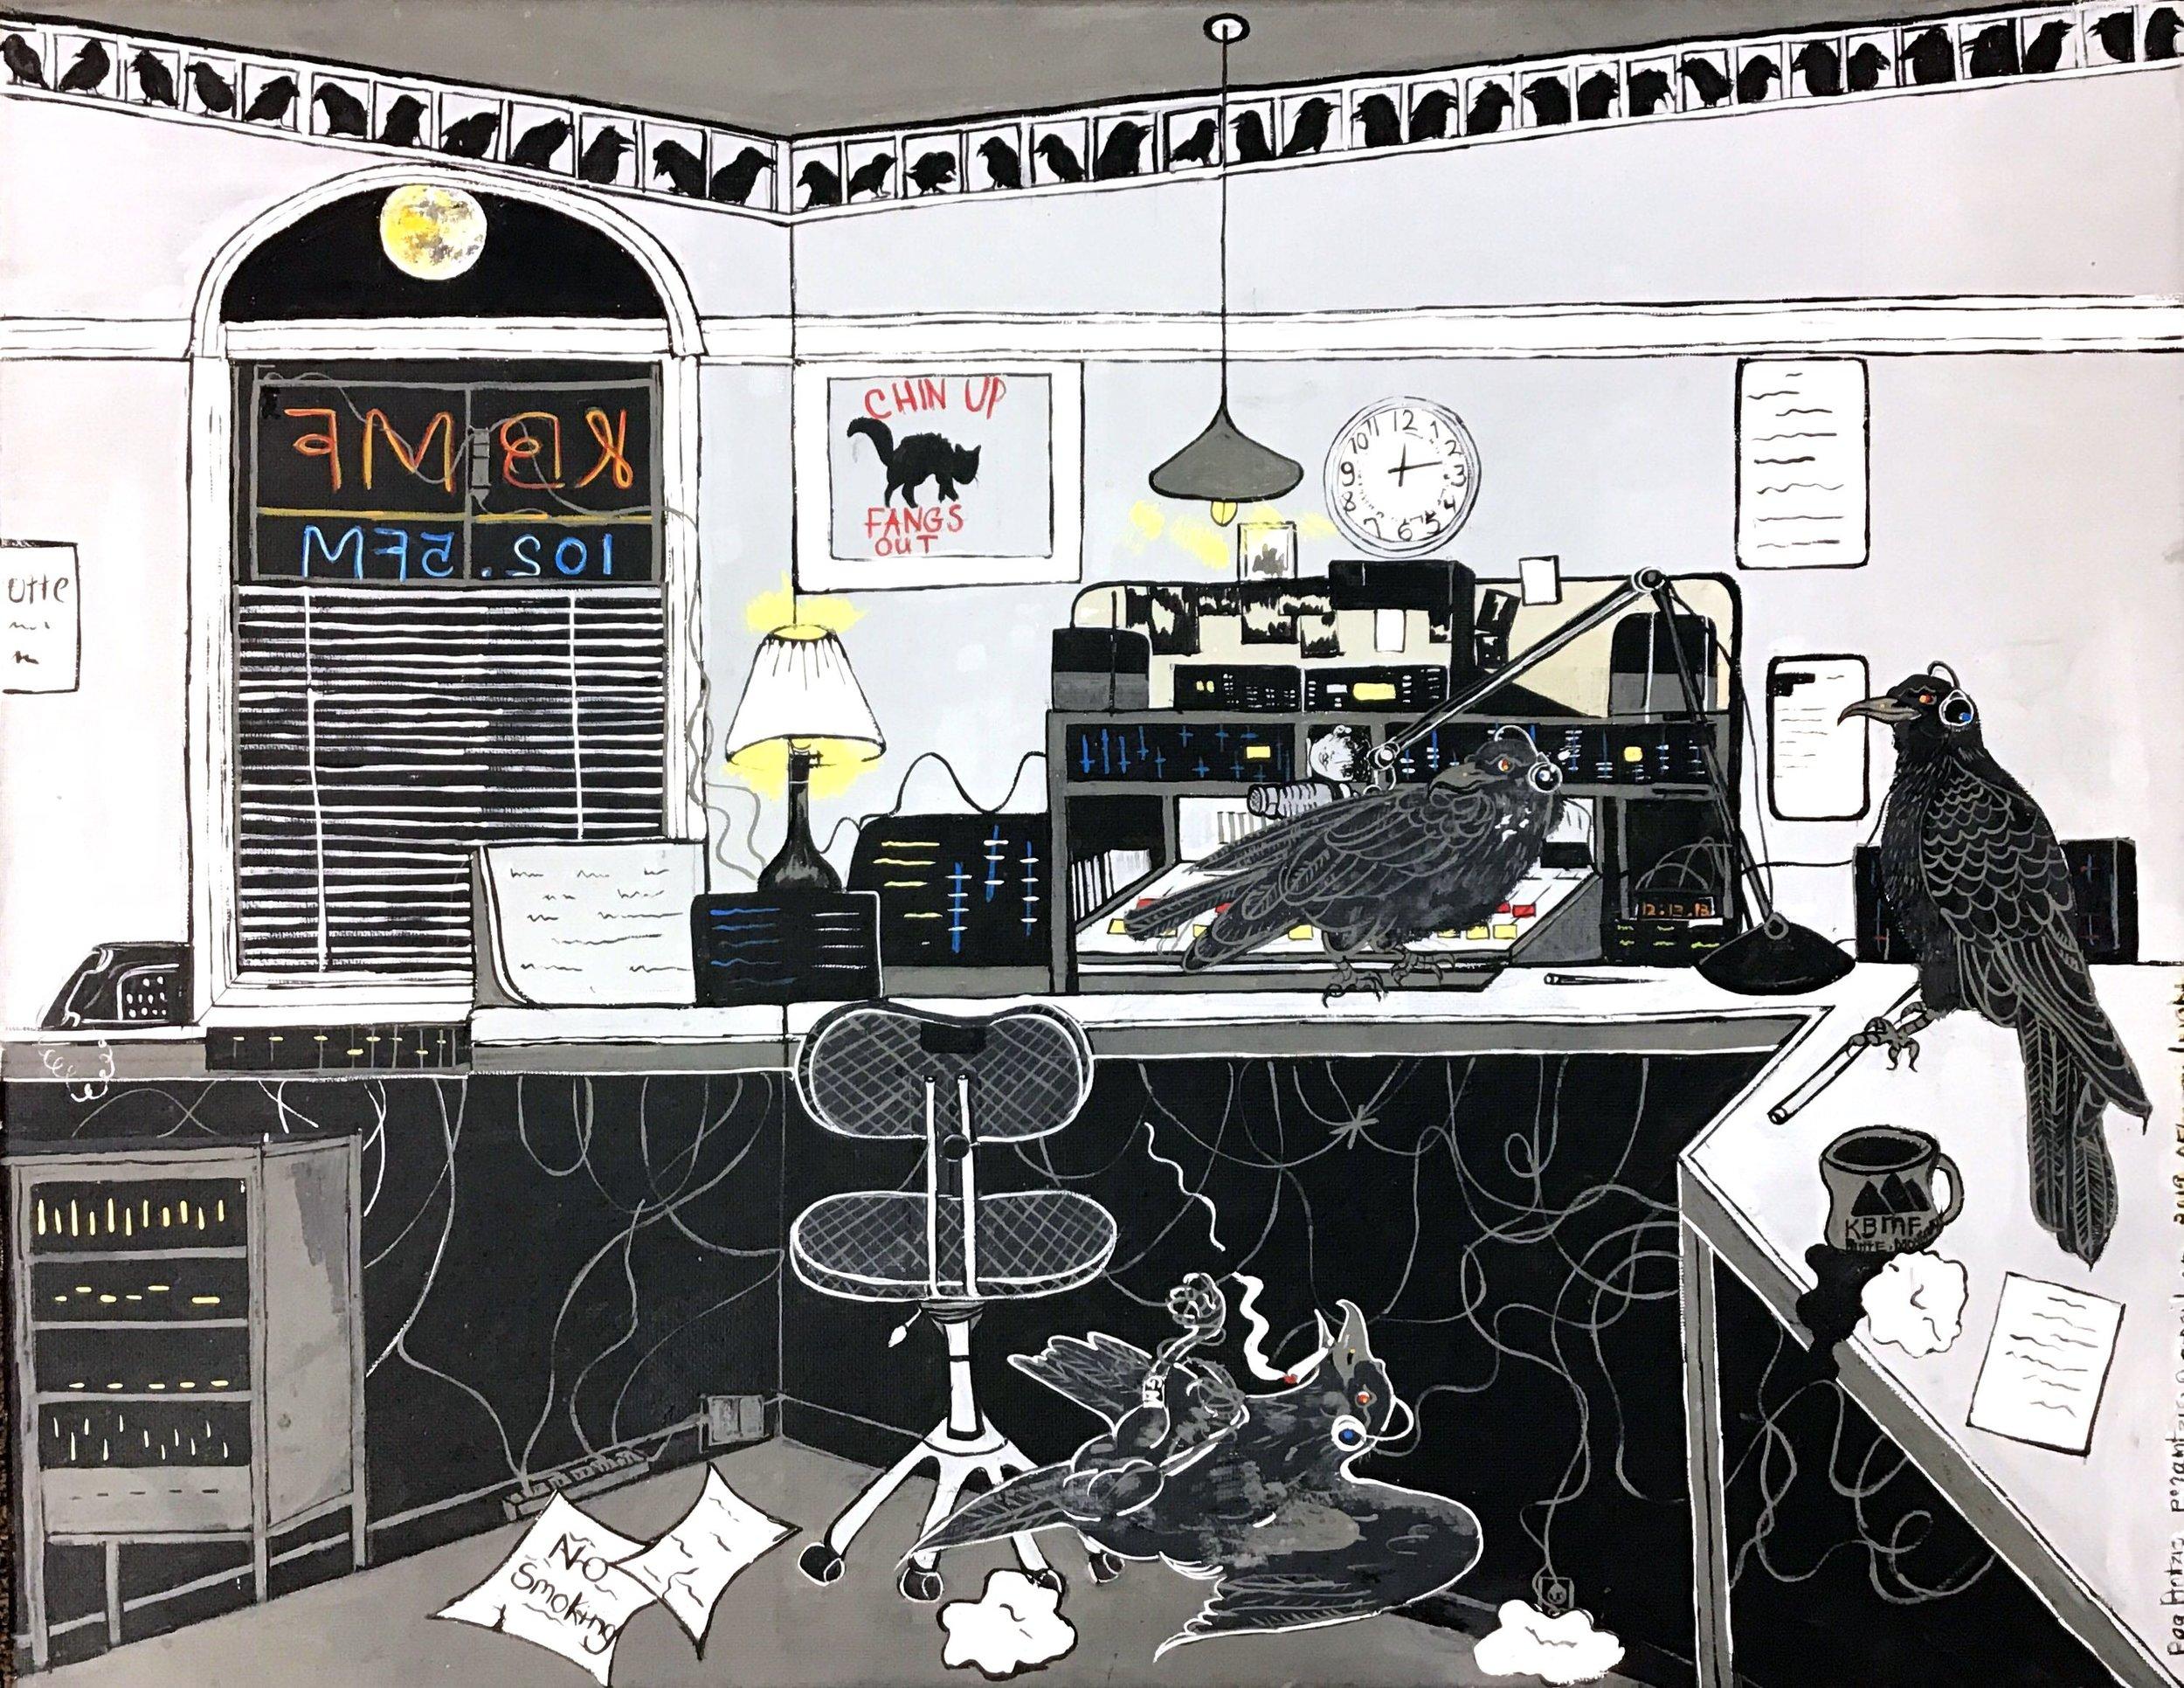 Painting by Peg Amtzis